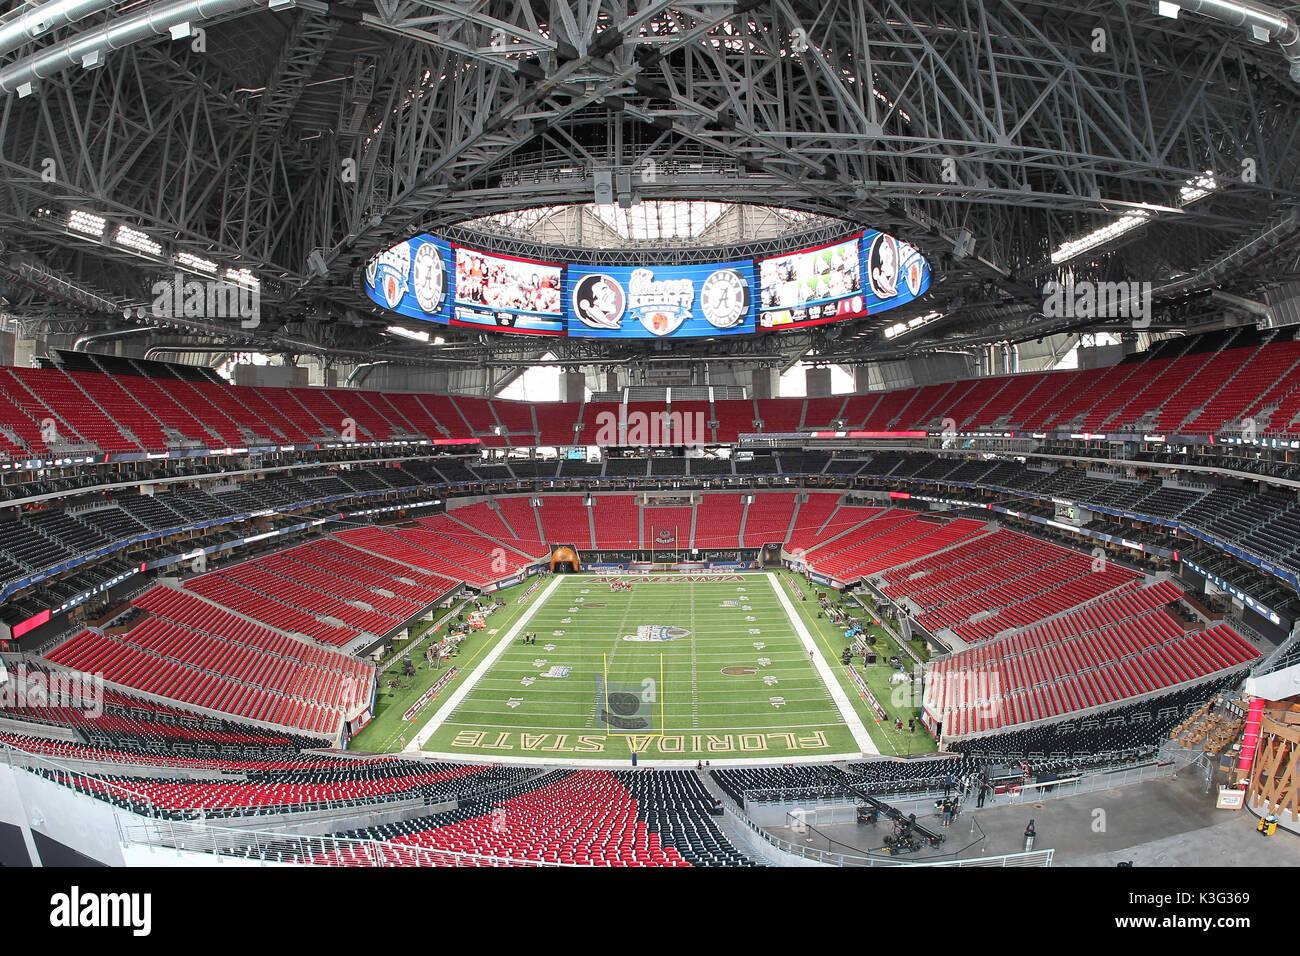 Mercedes benz stadium stock photos mercedes benz stadium for Atlanta ga mercedes benz stadium